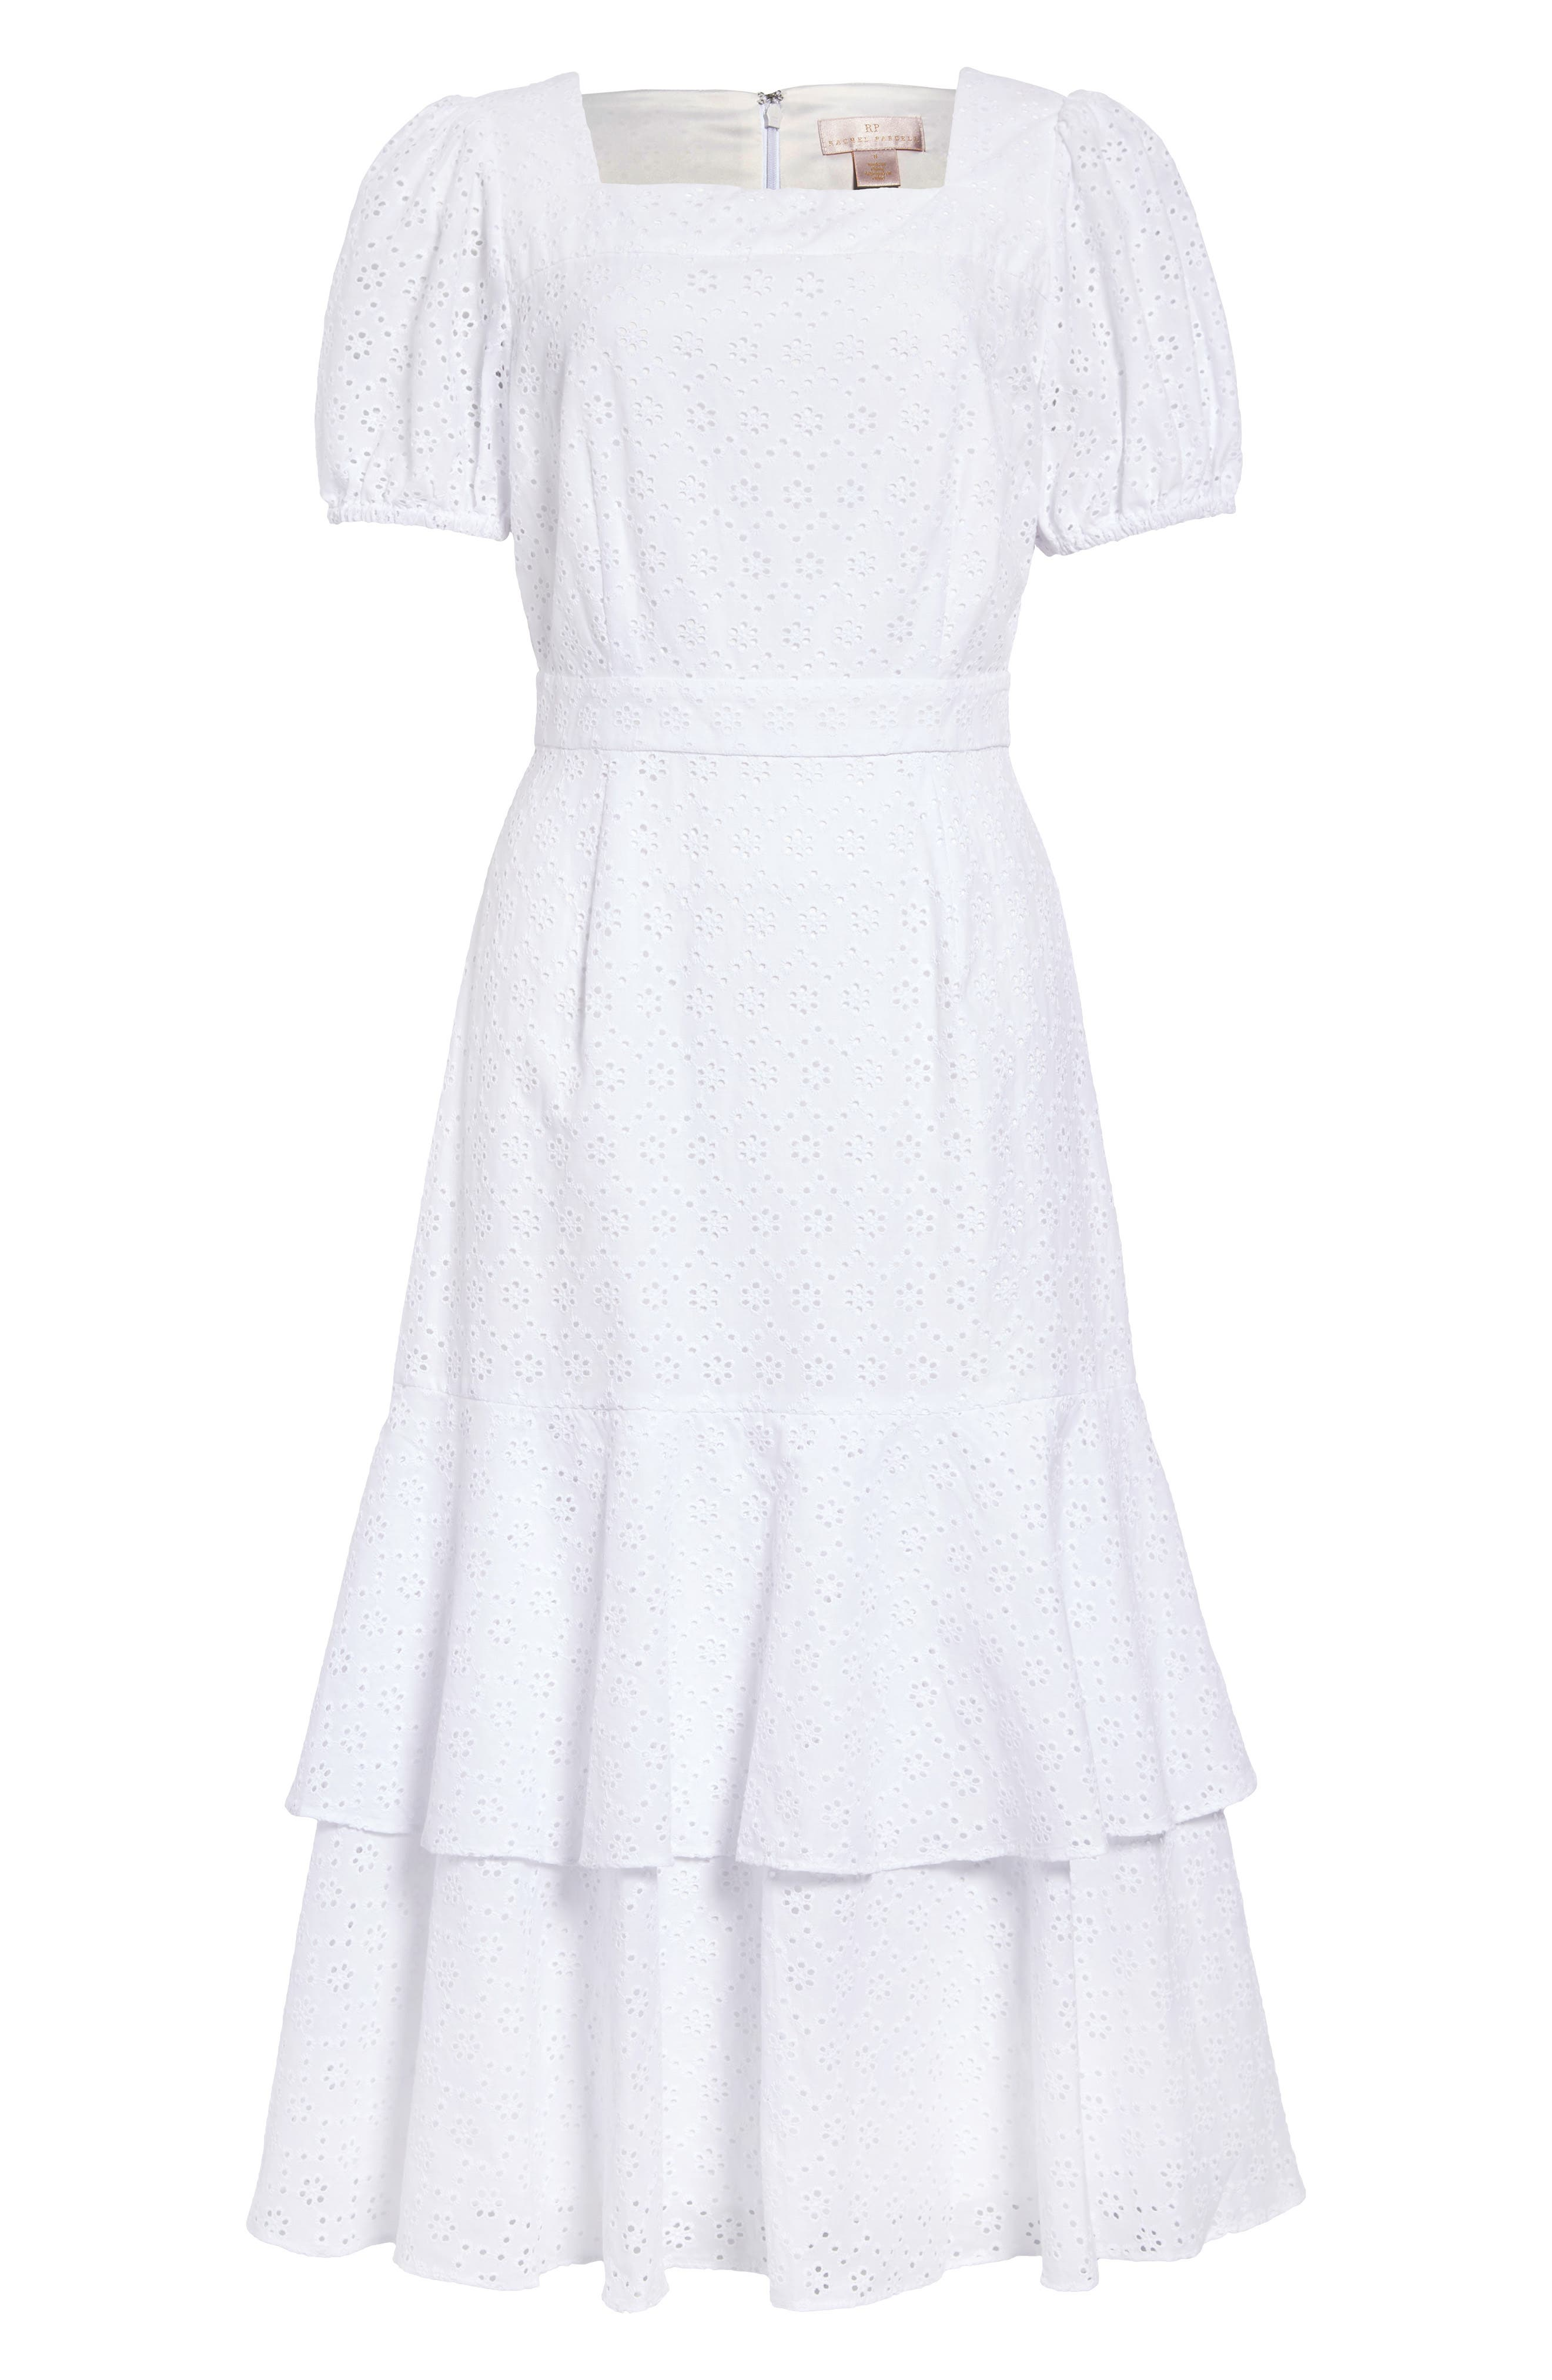 1900s Edwardian Dresses, 1910s Dresses Womens Rachel Parcell Tiered Eyelet Midi Dress Size - Nordstrom Exclusive $149.00 AT vintagedancer.com